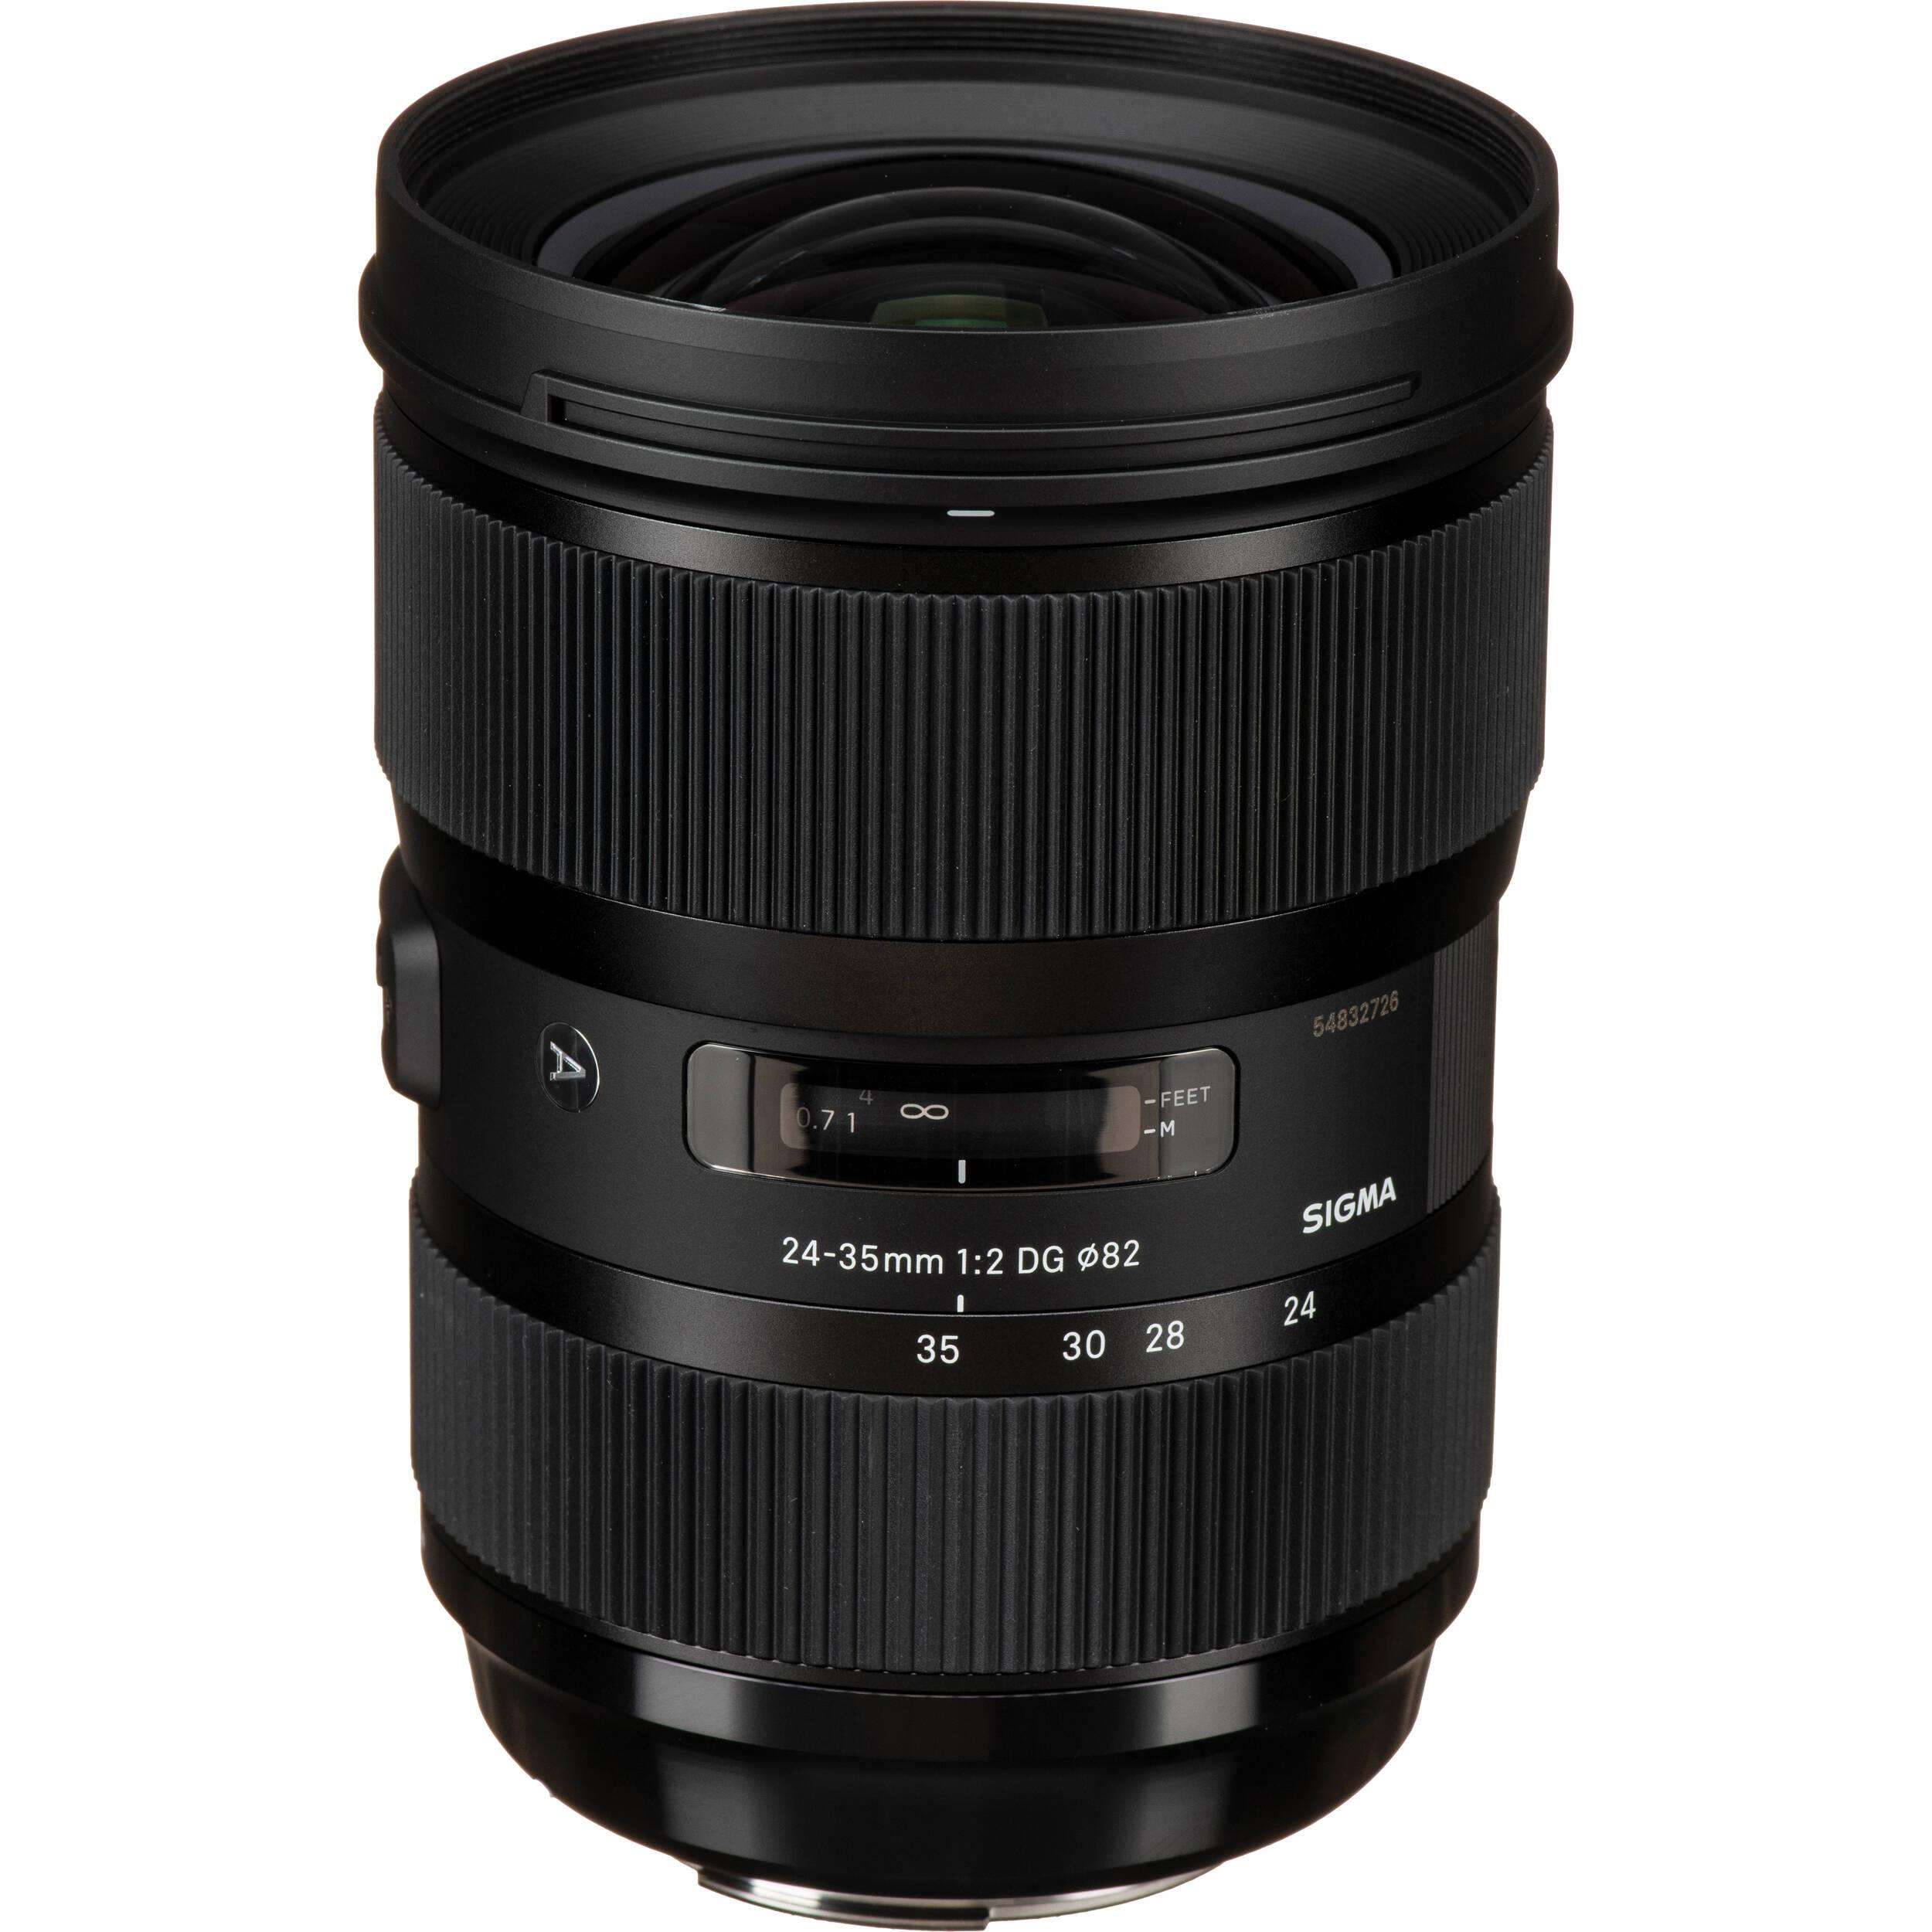 sigma 24 35mm f  2 dg hsm art lens for canon ef 588954 b h canon g1000 camcorder manual canon g1000 camcorder manual